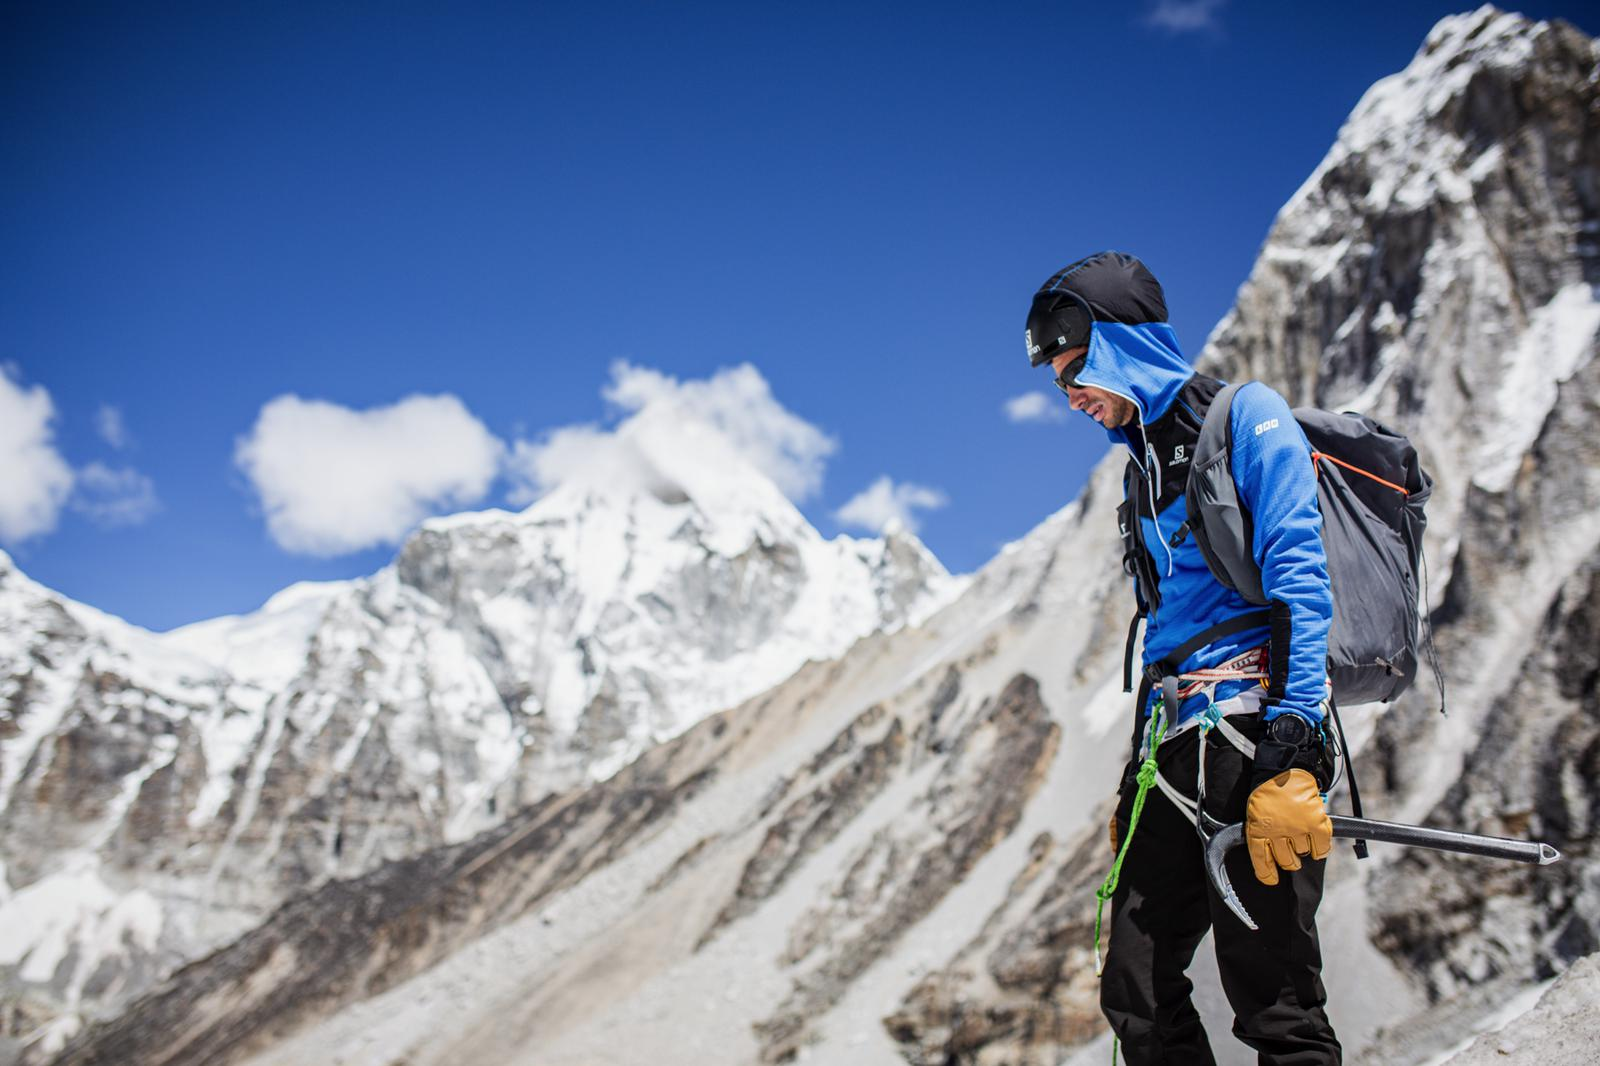 Kilian Jornet am Weg zum Mount Everest. Foto: Philip Reiter